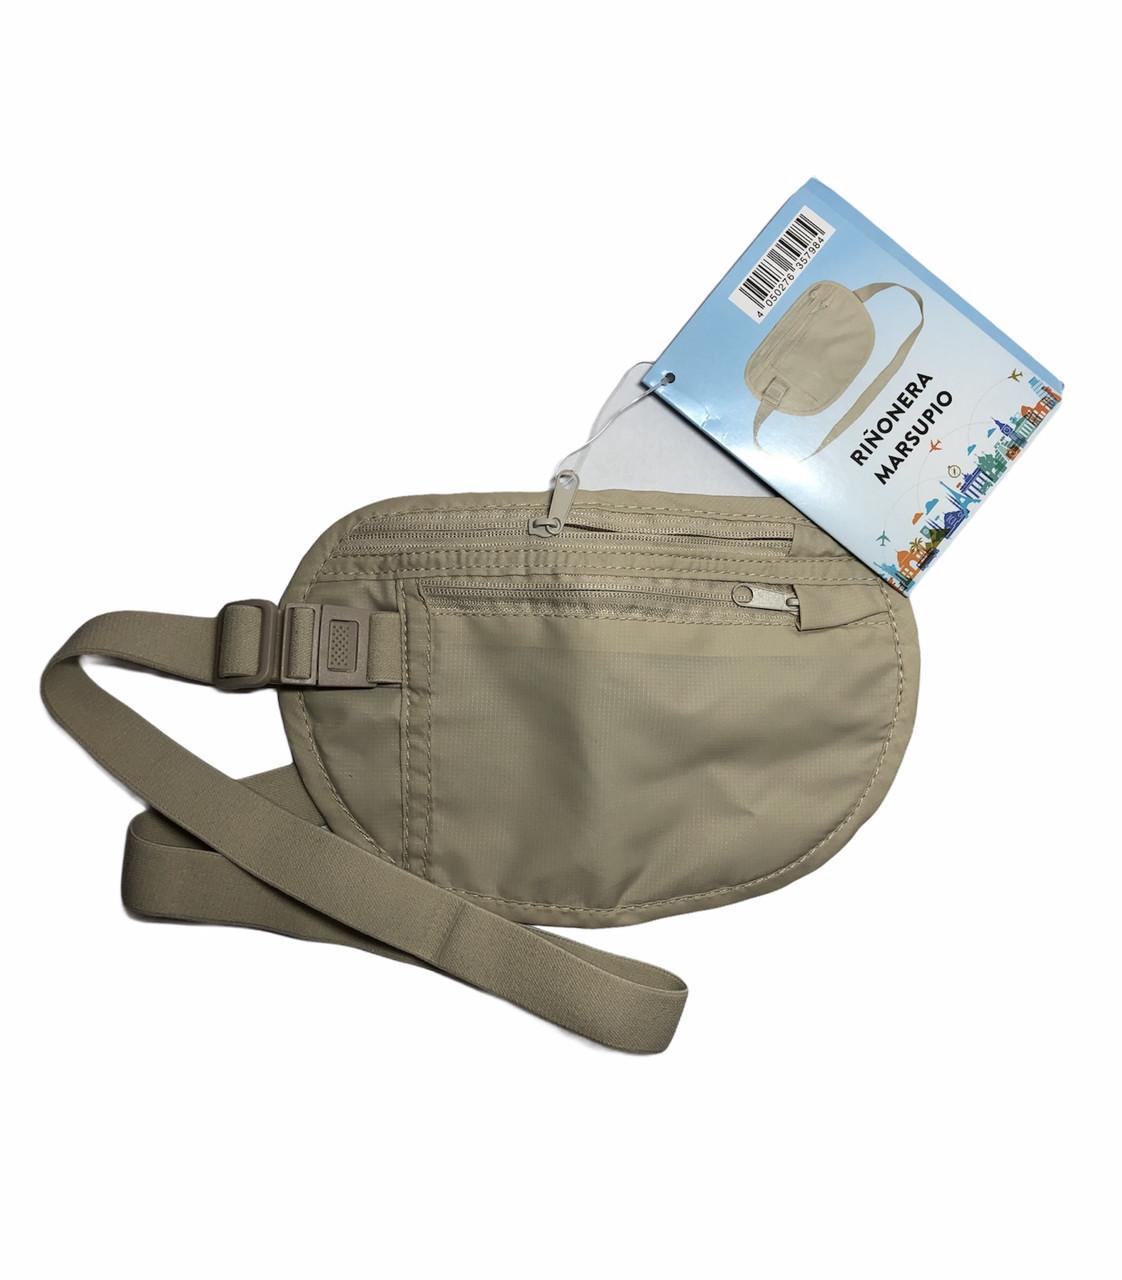 Поясна сумка-гаманець для подорожей LIDL